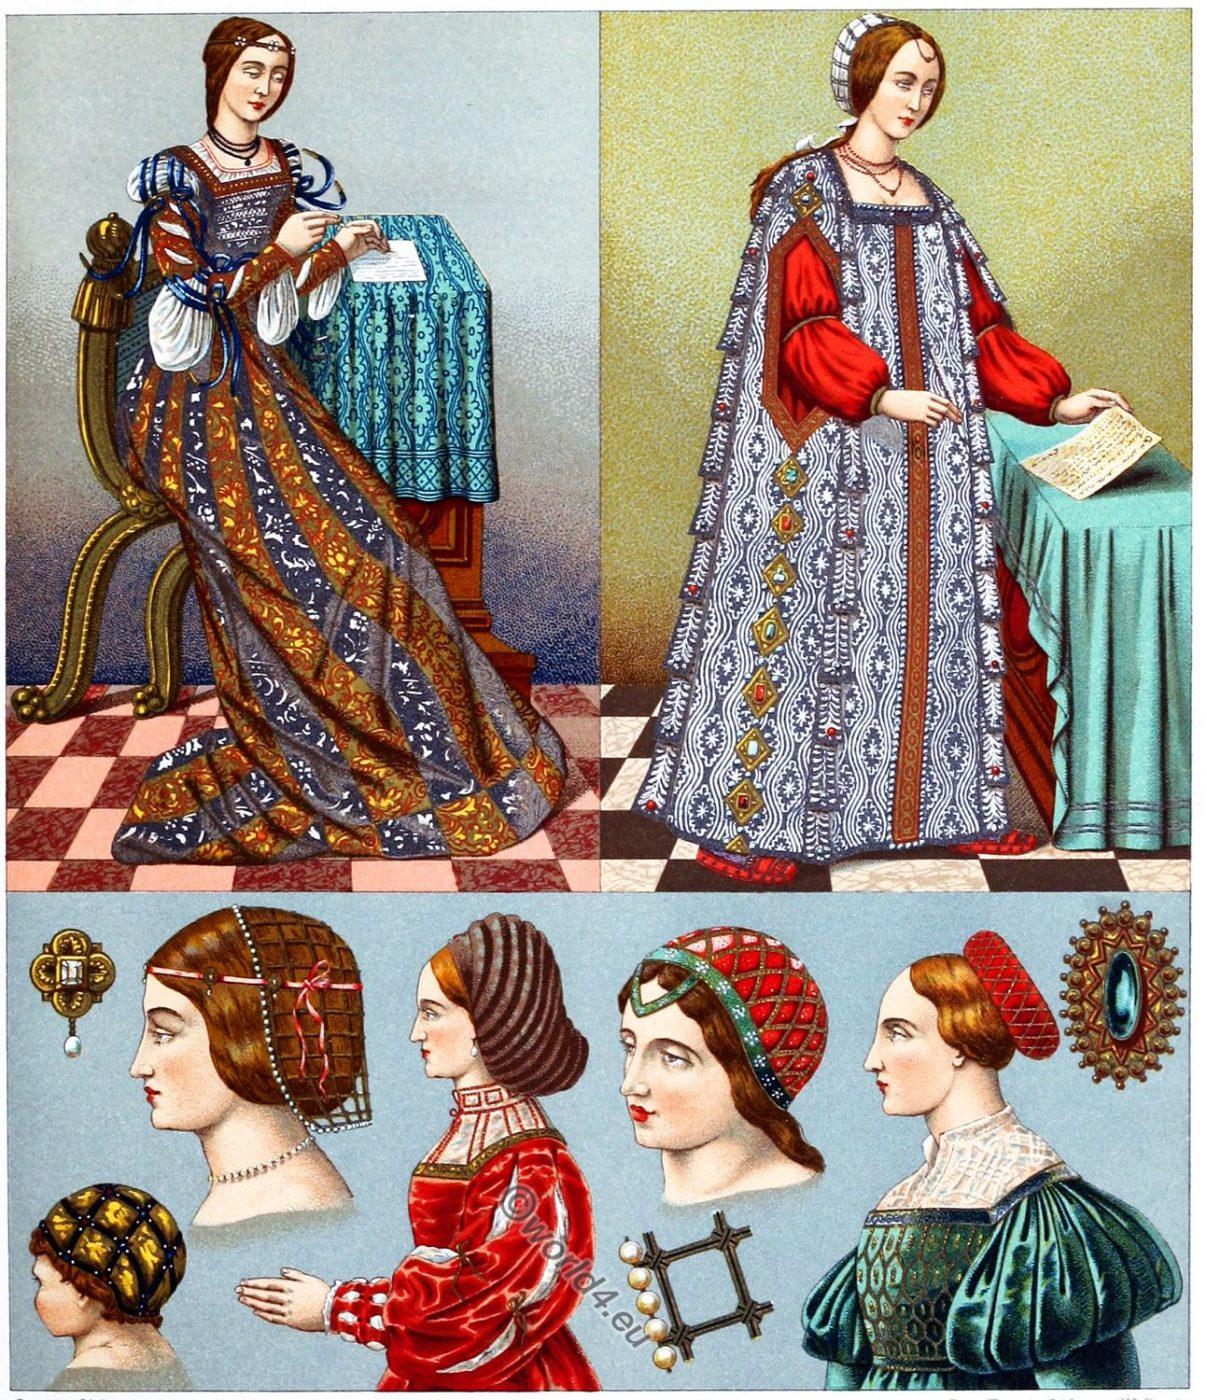 Female costumes, Renaissance, Italy, 16th century, clothing, dress, headgear, Auguste Racinet,